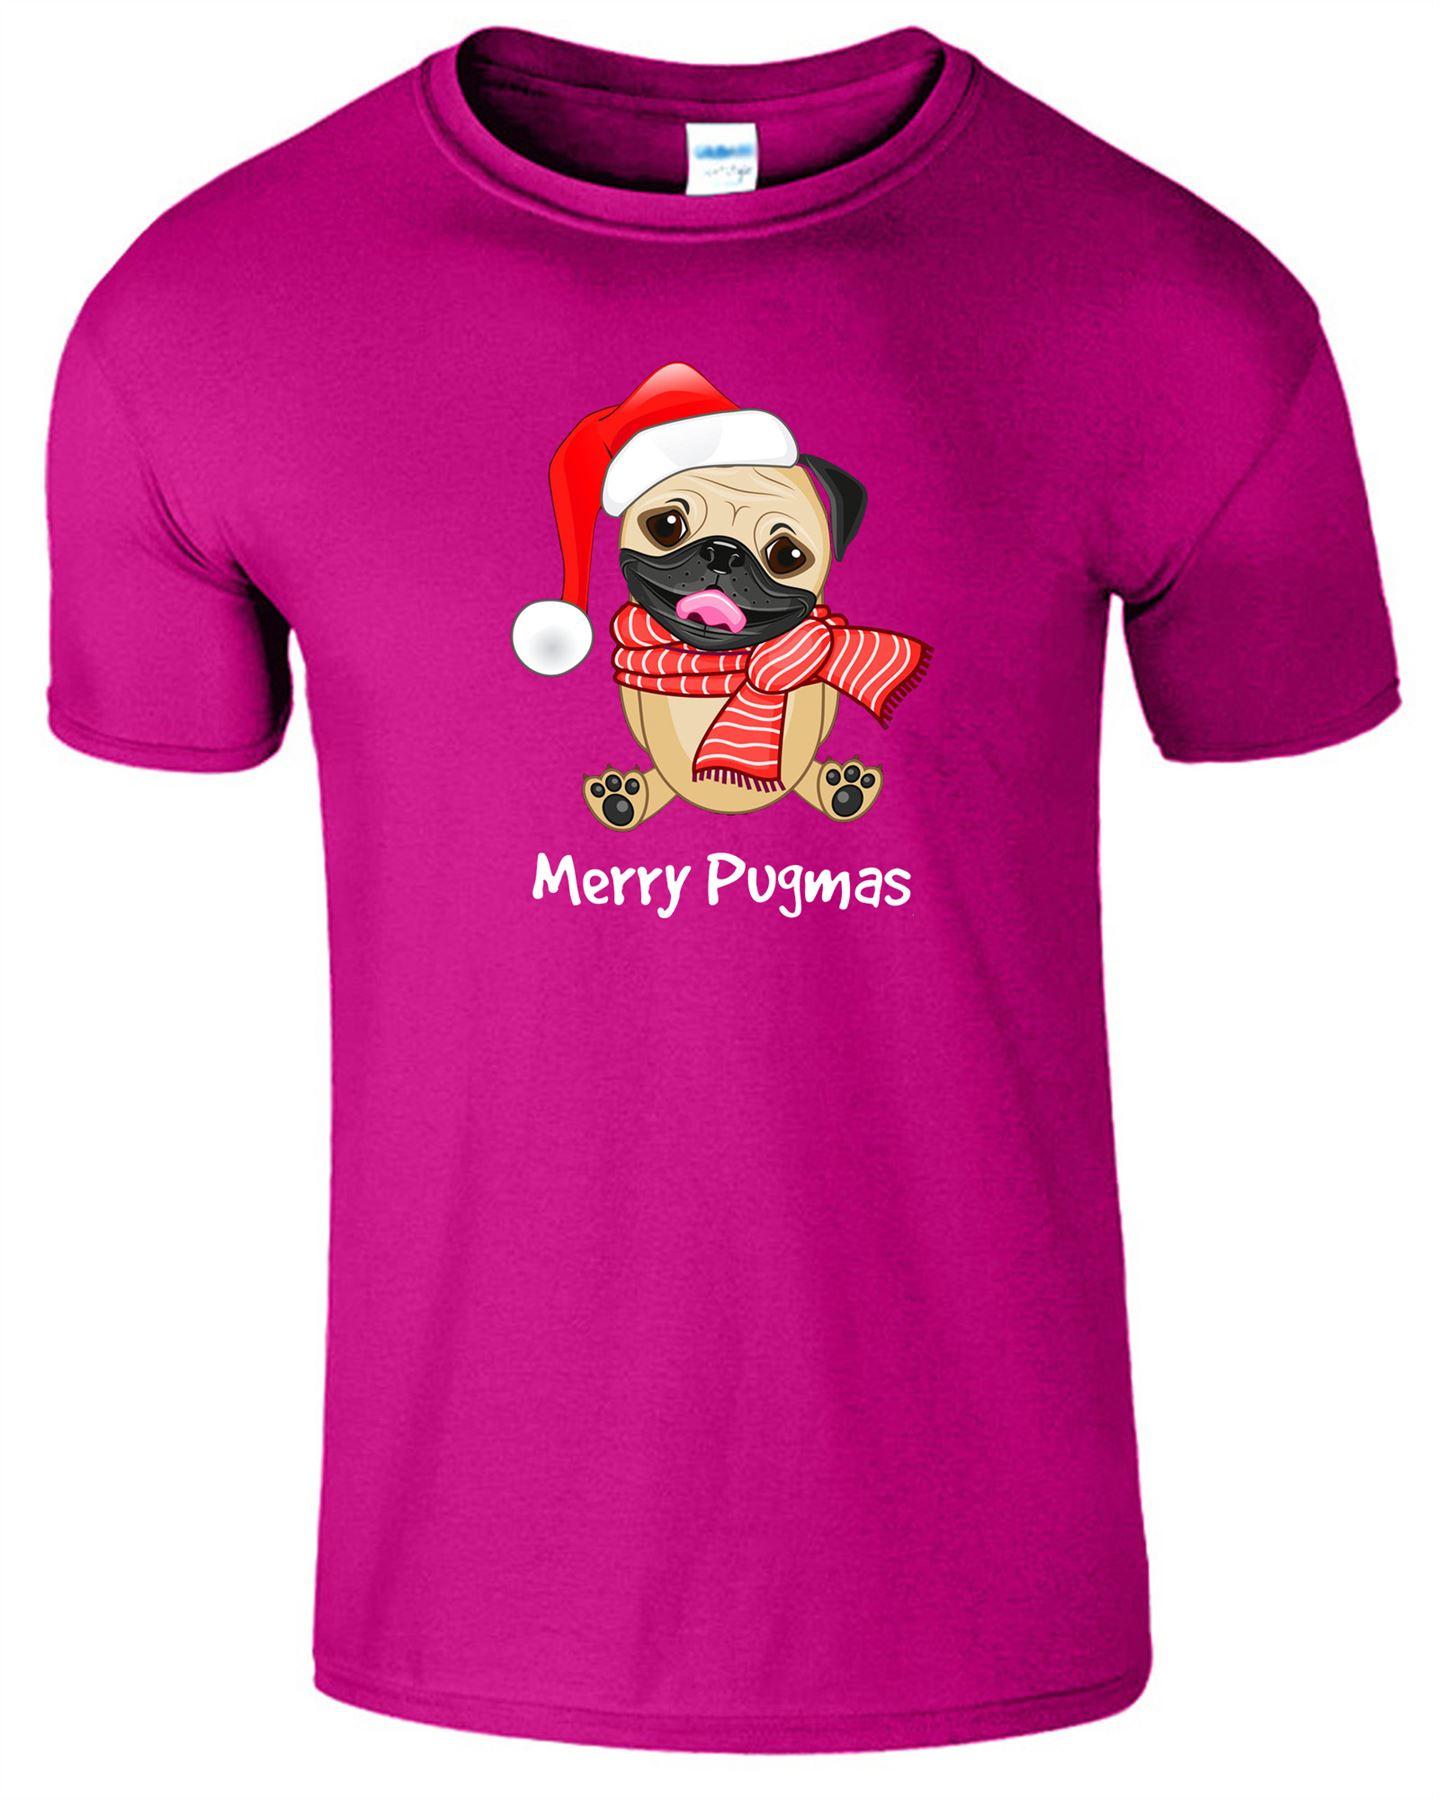 Merry Pugmas Christmas Mens Womens T Shirt Wearing Santa Hat Dog Top Tee T-Shirt